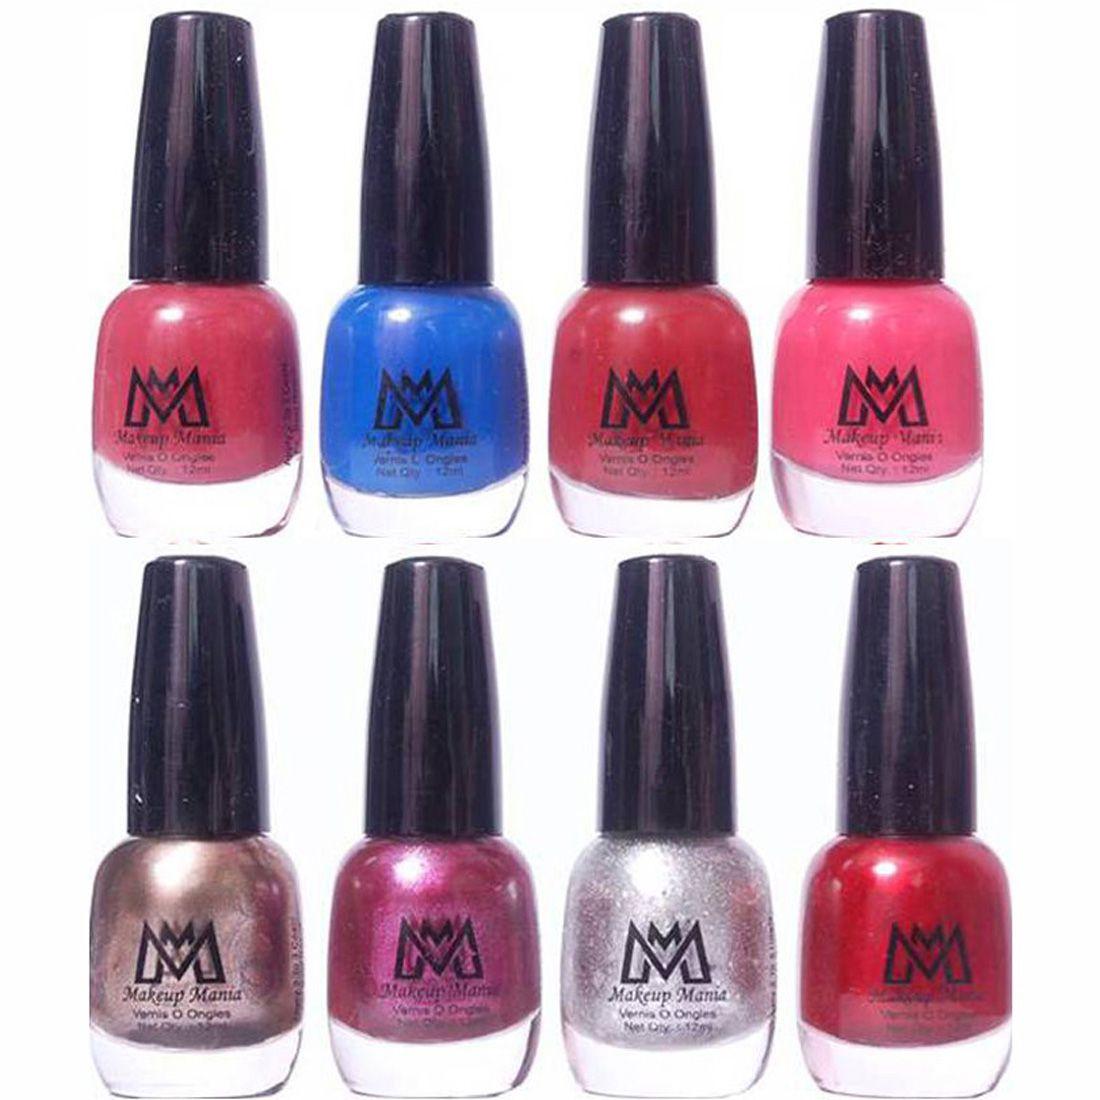 Makeup Mania Premium Set of 8 Trendy Nail Polish Brown Blue Shiny Purple & Red Glossy 96 ml